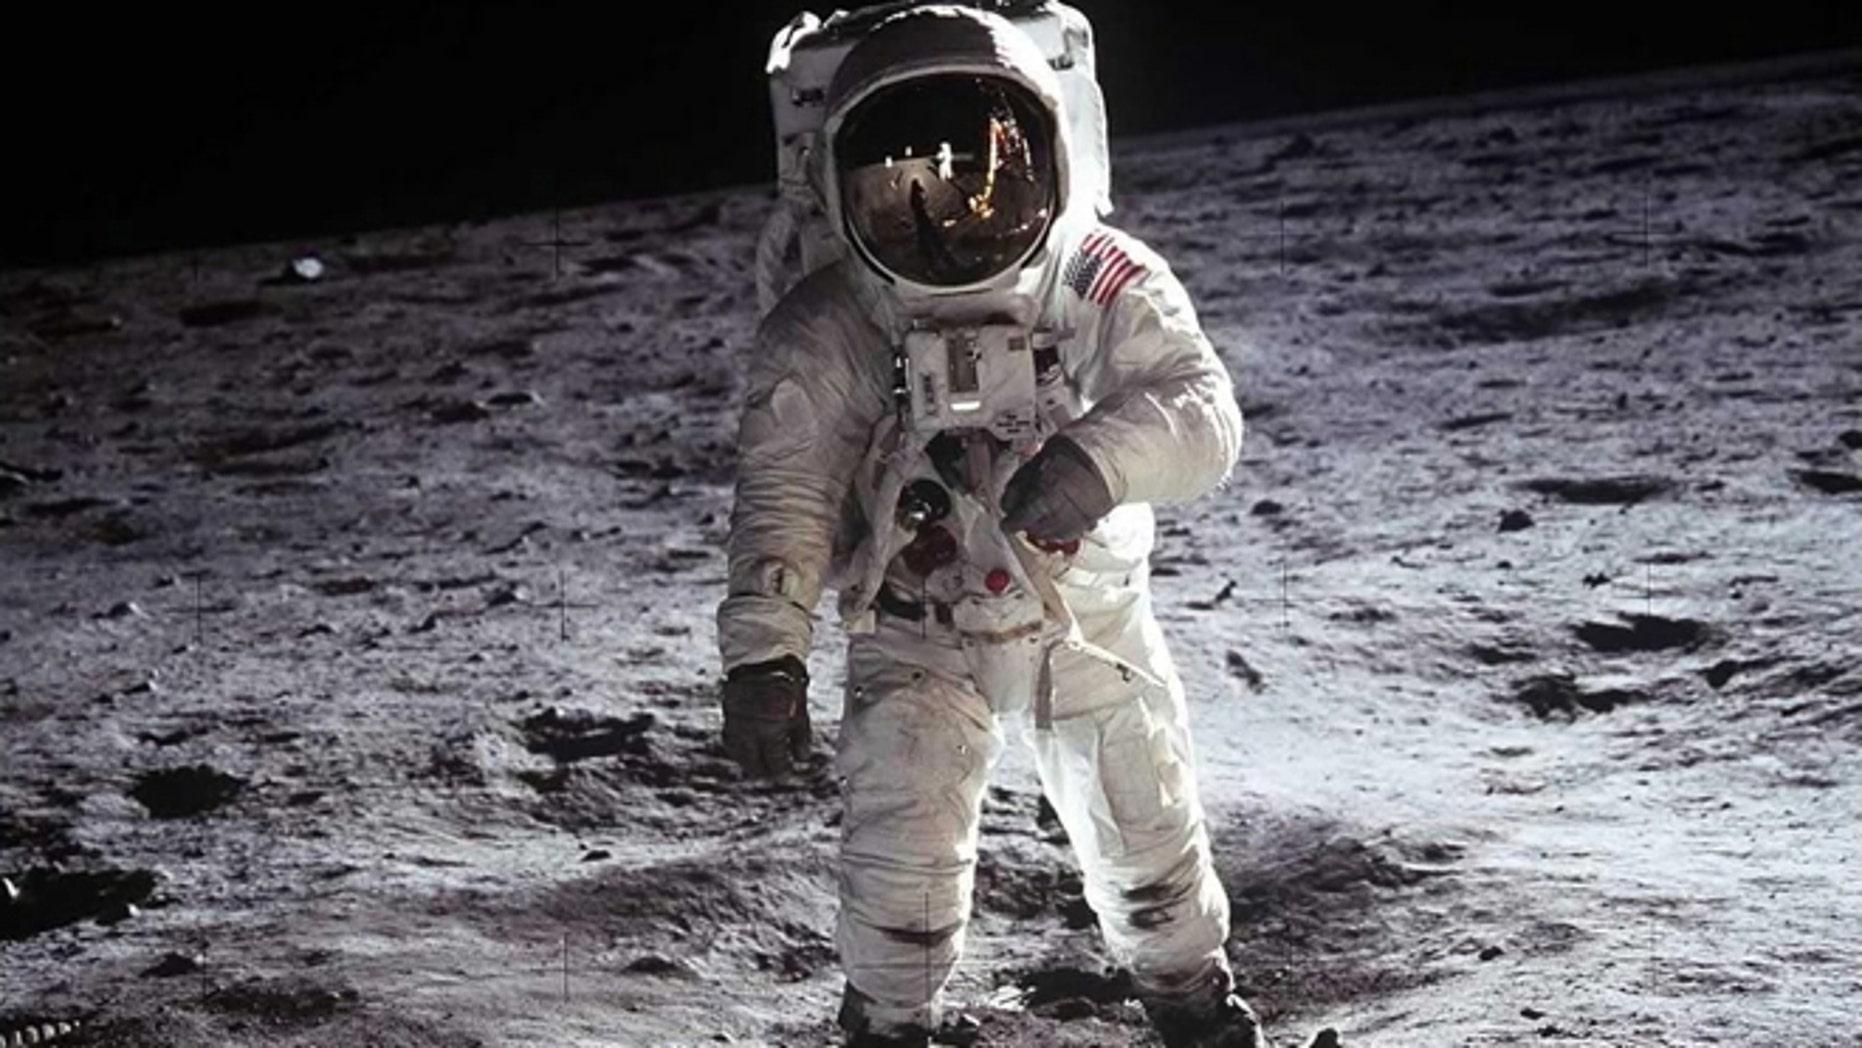 "2. Buzz Aldrin, Apollo 11, 1969: Astronaut Buzz Aldrin, lunar module pilot, walks on the surface of the Moon near the leg of the Lunar Module ""Eagle"" during the Apollo 11 extravehicular activity (EVA). Astronaut Neil A. Armstrong, commander, took this photograph with a 70mm lunar surface camera."